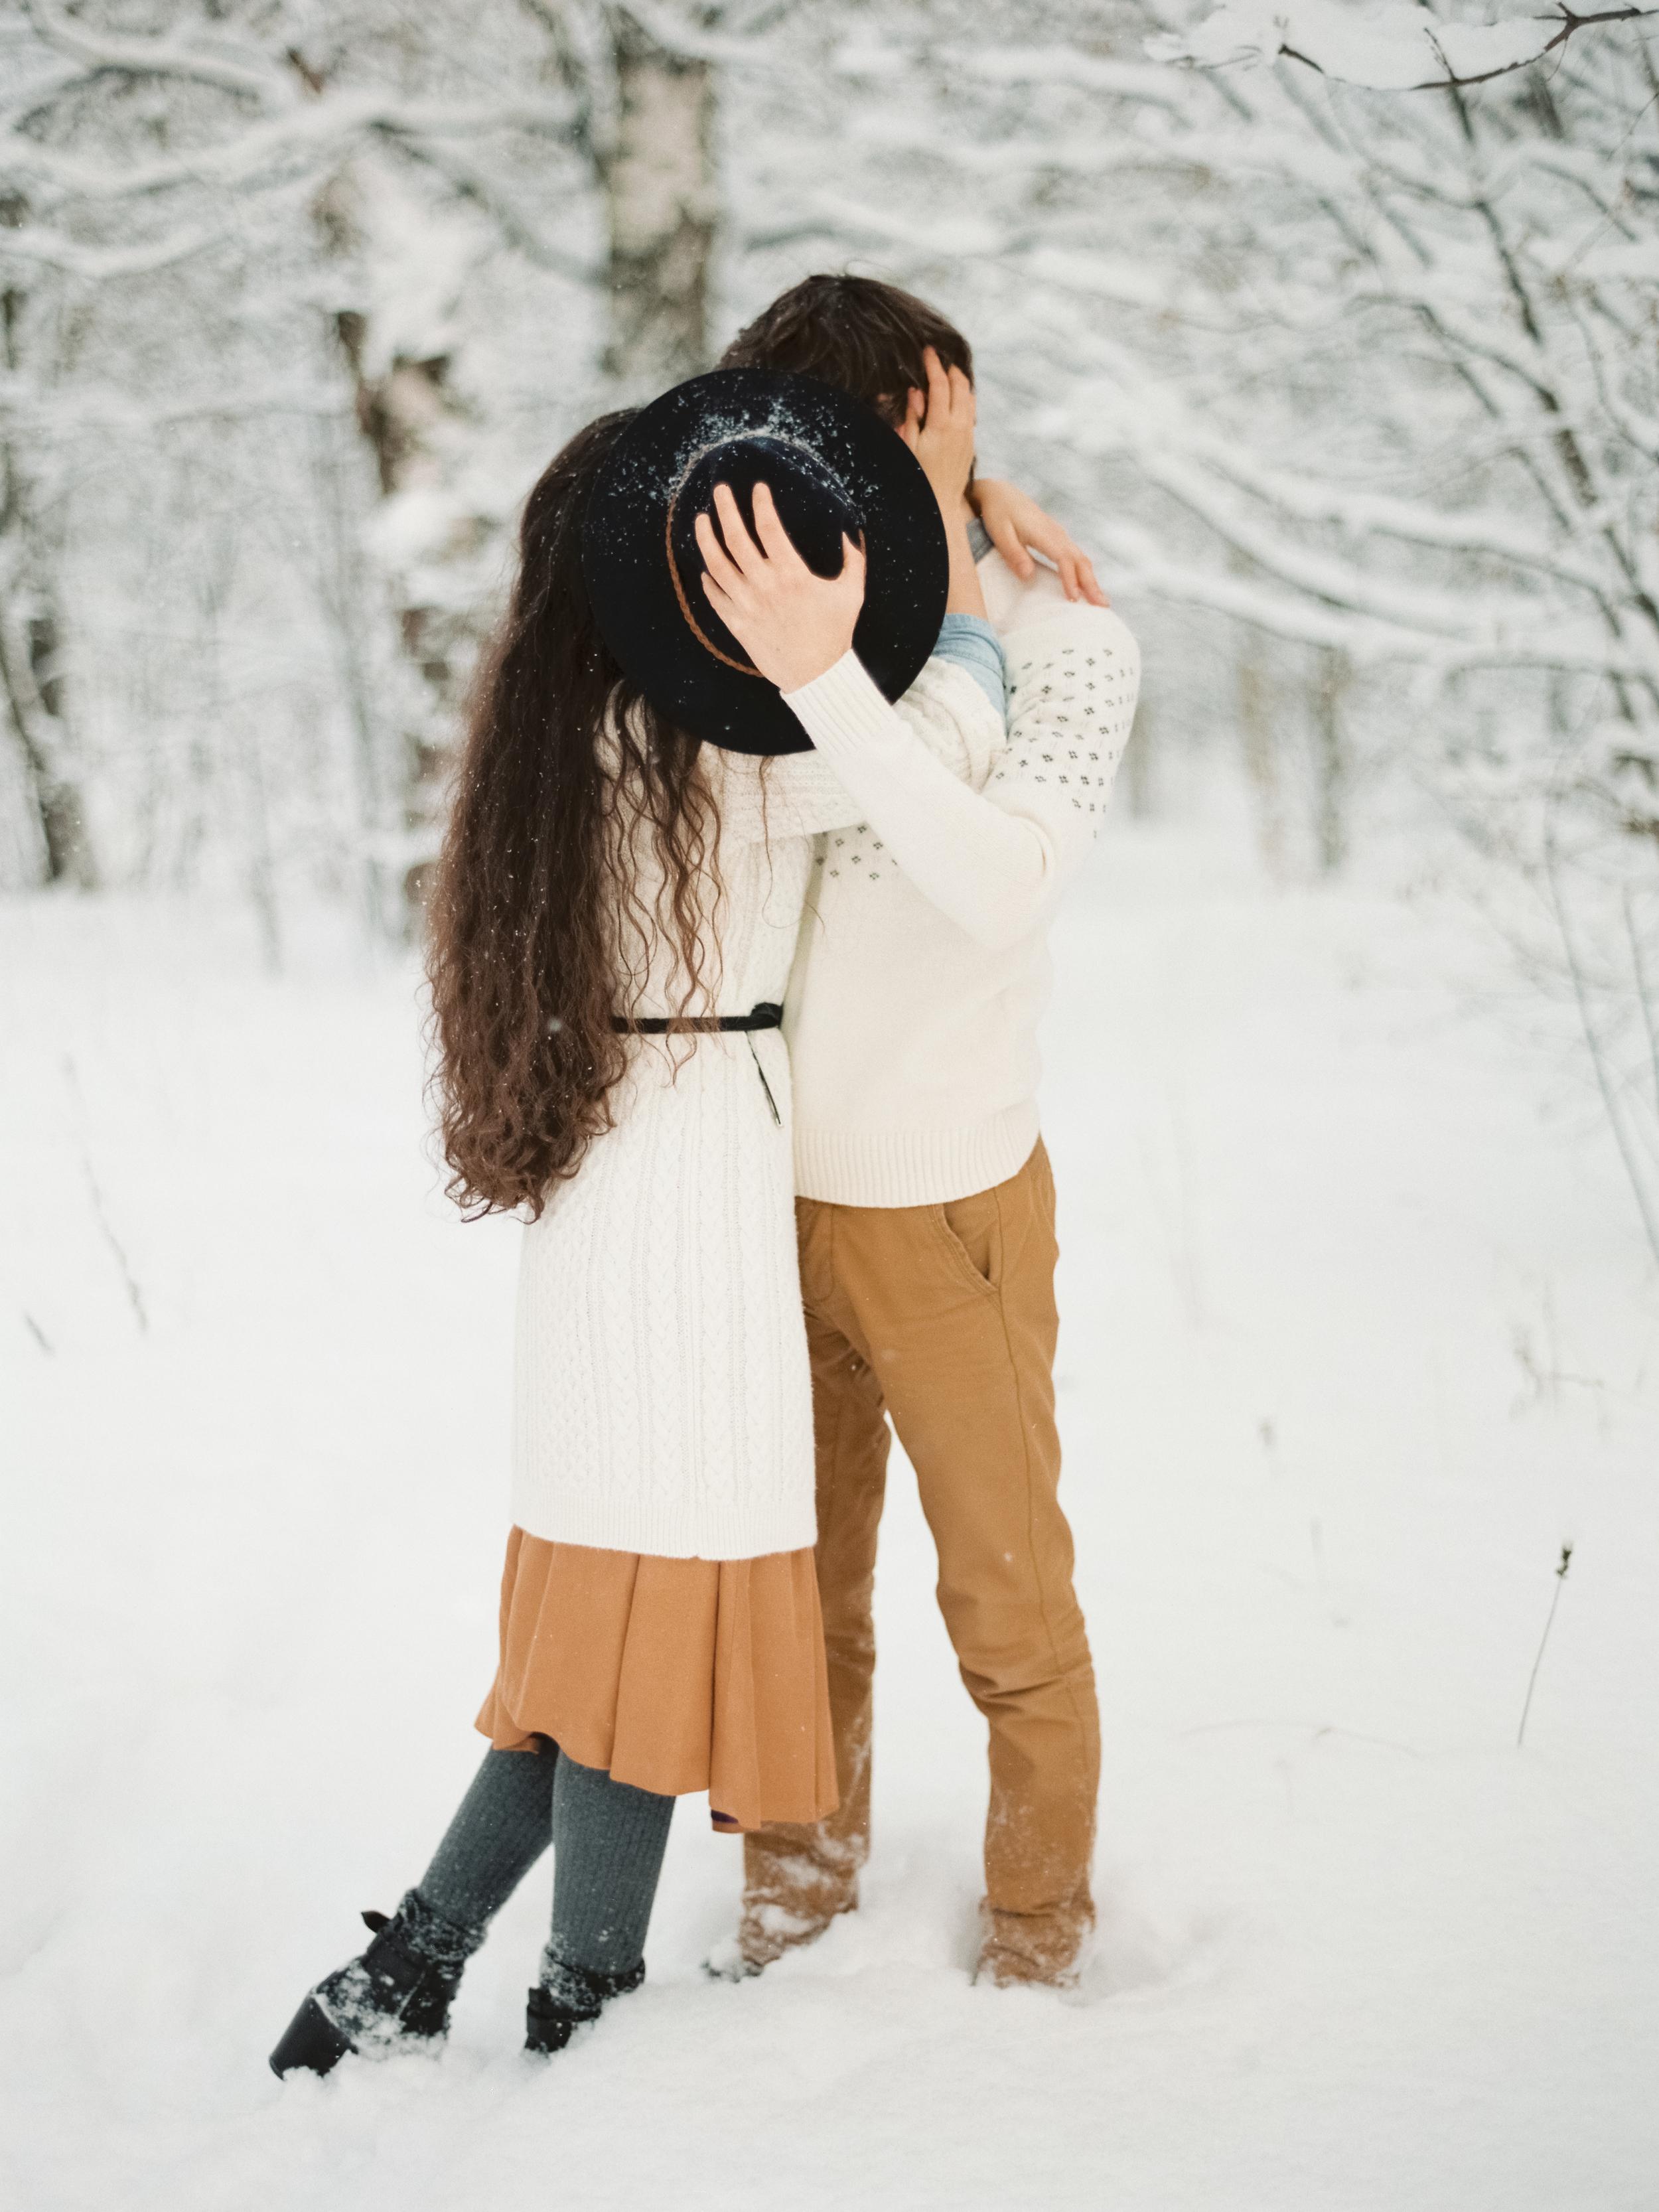 Tamara Gigola Photography winter shoot. Duet Postscriptum. Moscow. Russia. -0006-6.JPG